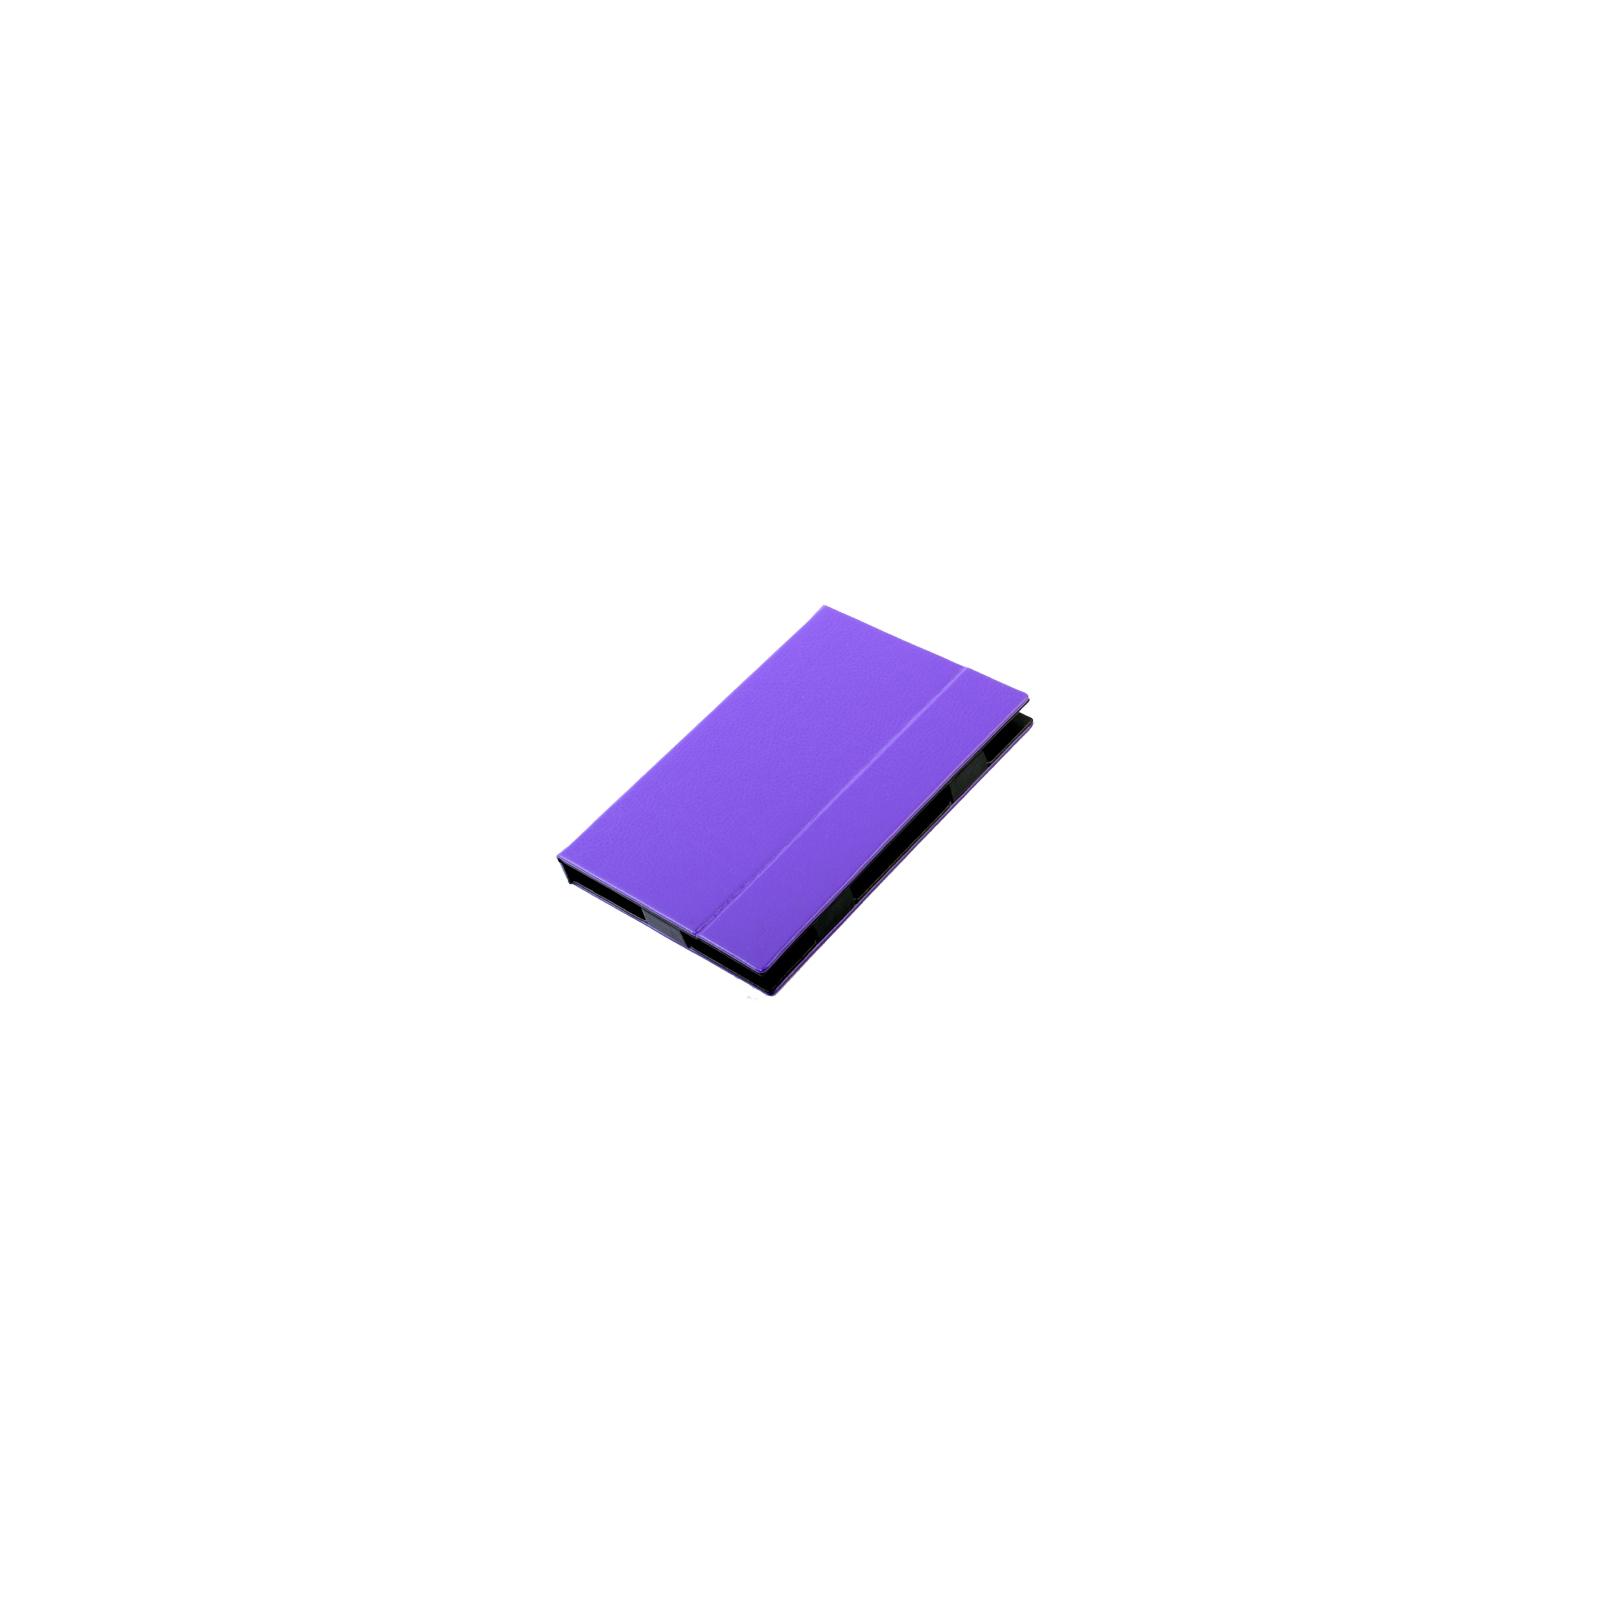 Чехол для планшета Vento 8 Desire Bright - purple